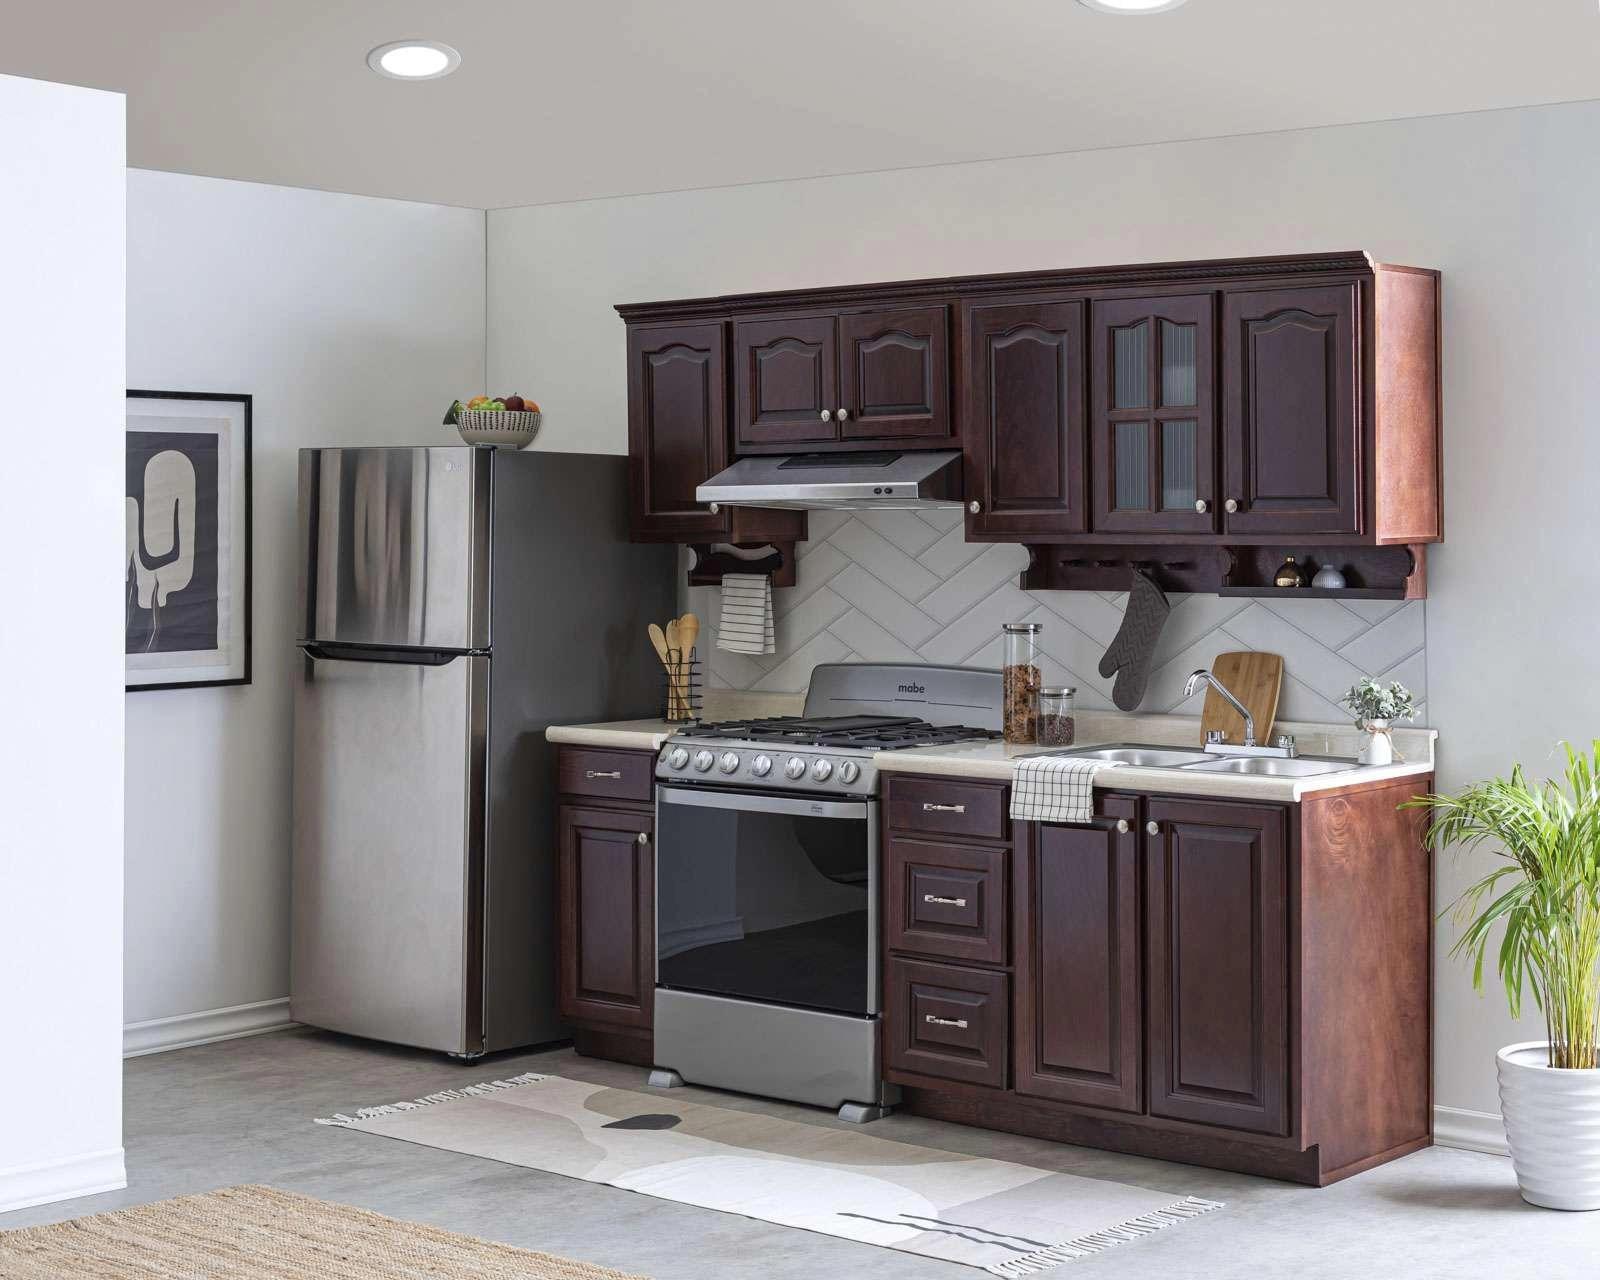 Cocina texas 240 cm con 9 puertas 3117233 coppel for Puertas cocina integral